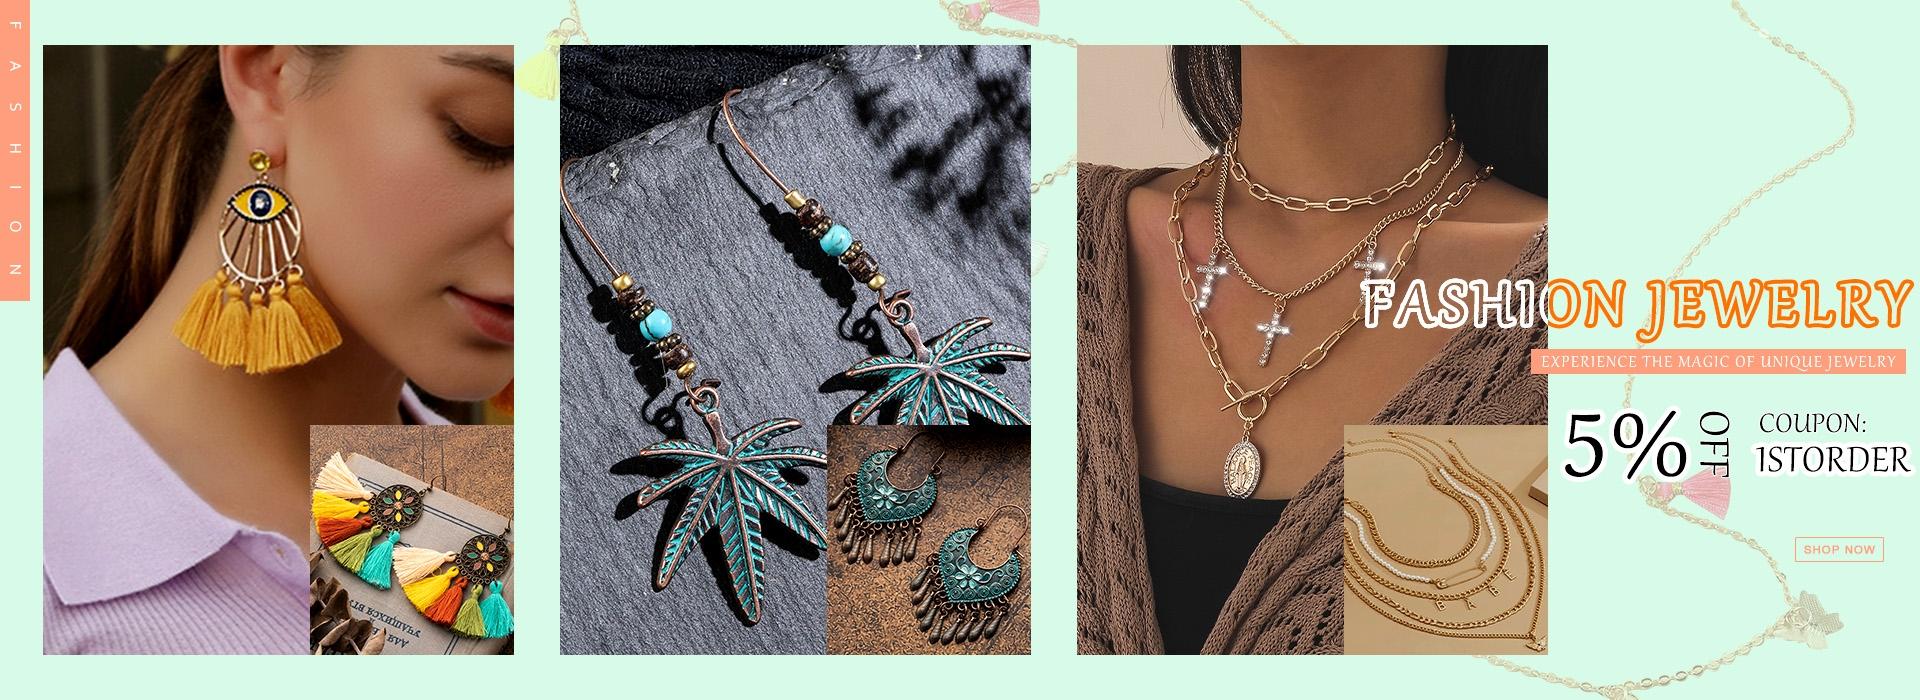 https://www.ookjewelry.com/wholesale-fashion-jewelry.html